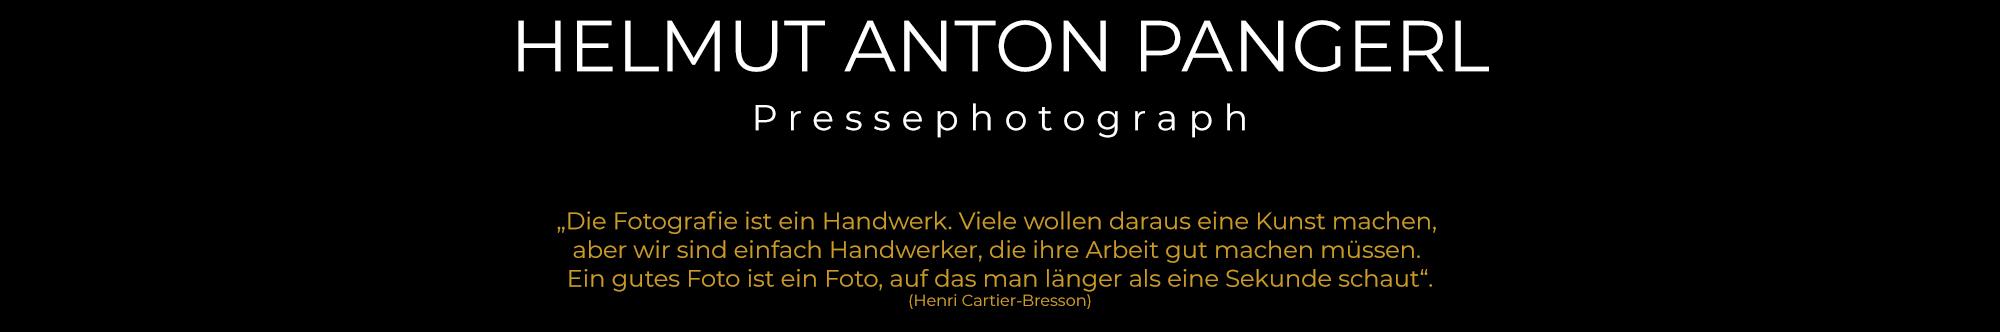 Pressephotographie